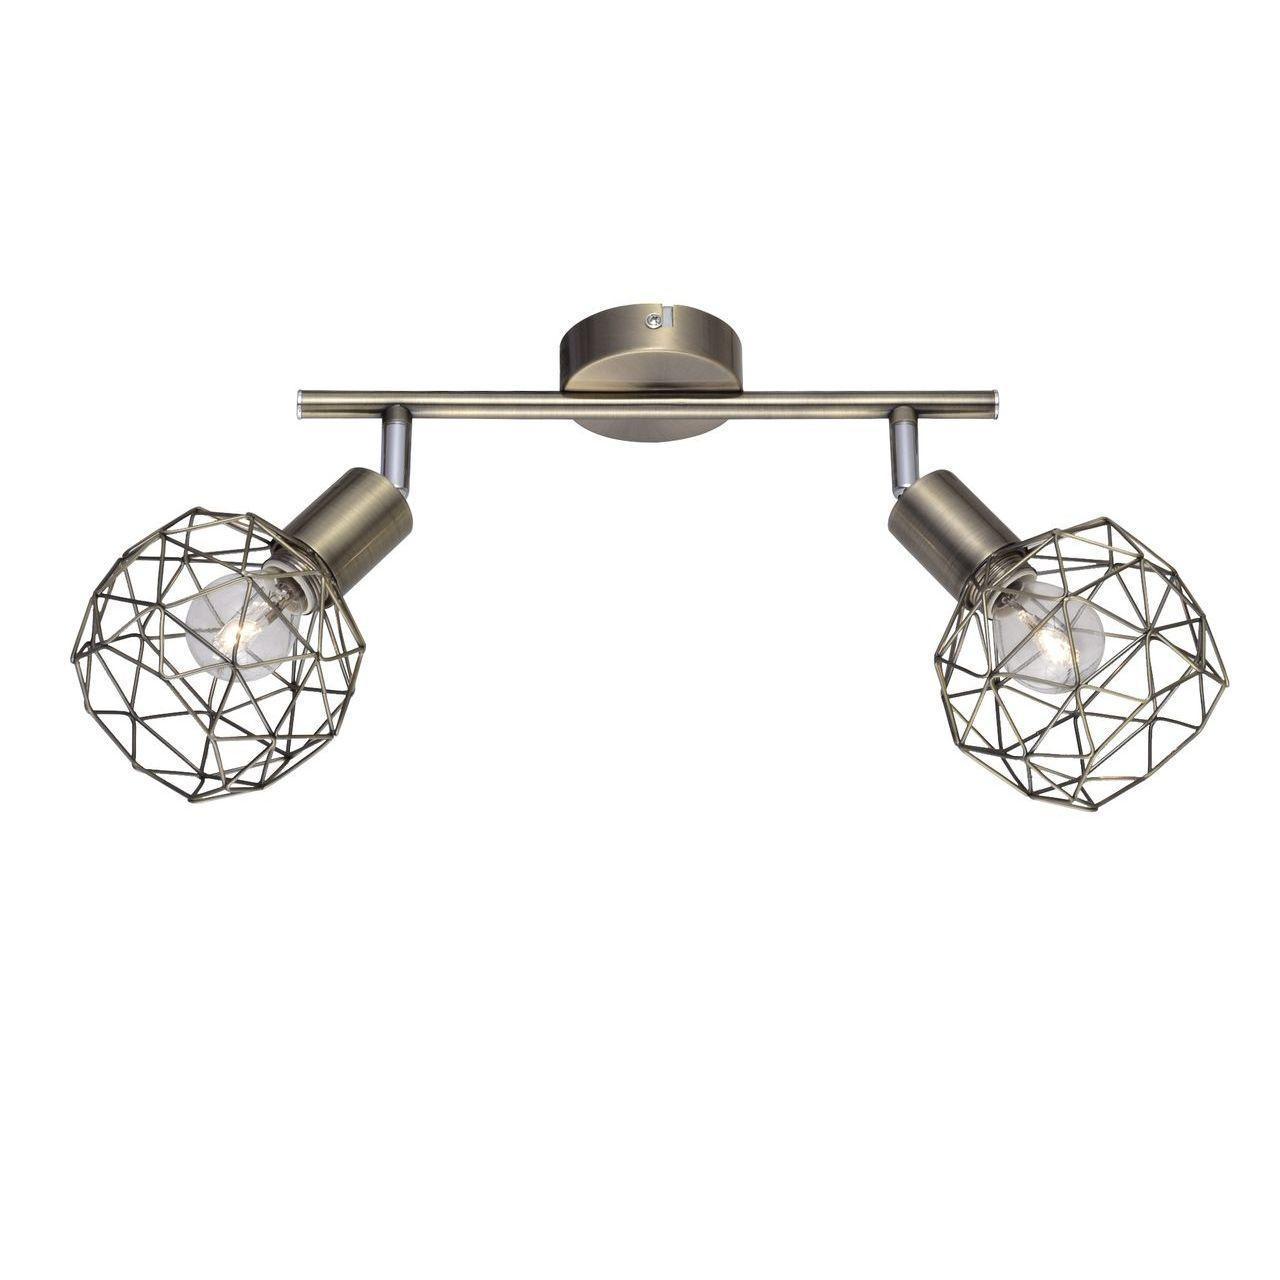 Спот Arte Lamp Sospiro A6141AP-2AB спот arte lamp sospiro a6141ap 2ab